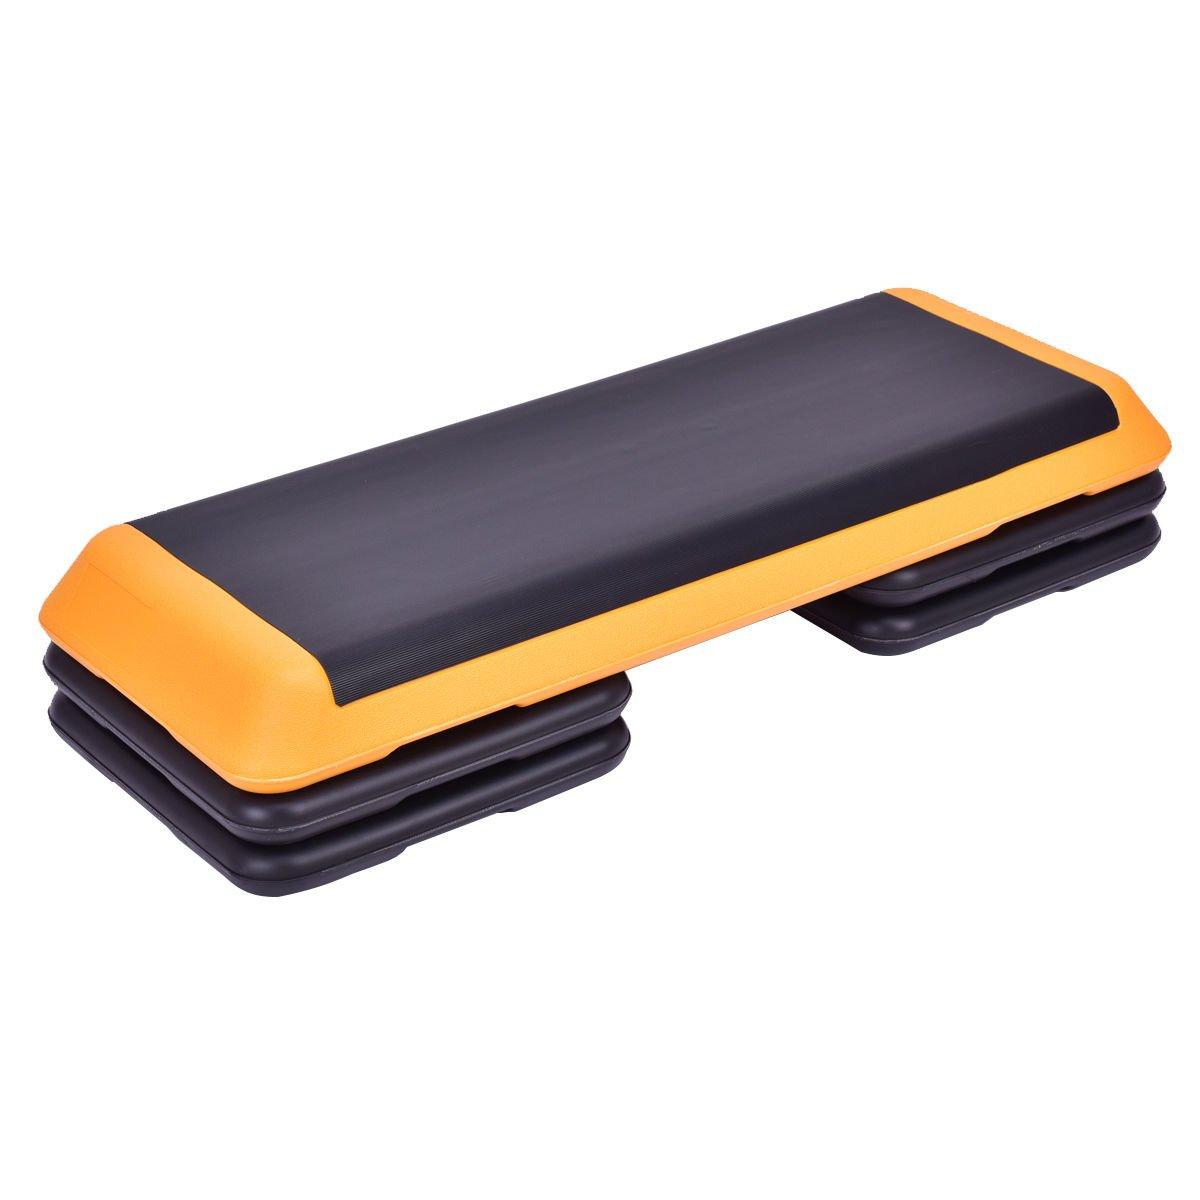 Goplus 43'' Adjustable Fitness Aerobic Step Stepper Platform 4'' - 6'' - 8'' Non-Stick Surface W/Risers (Orange)